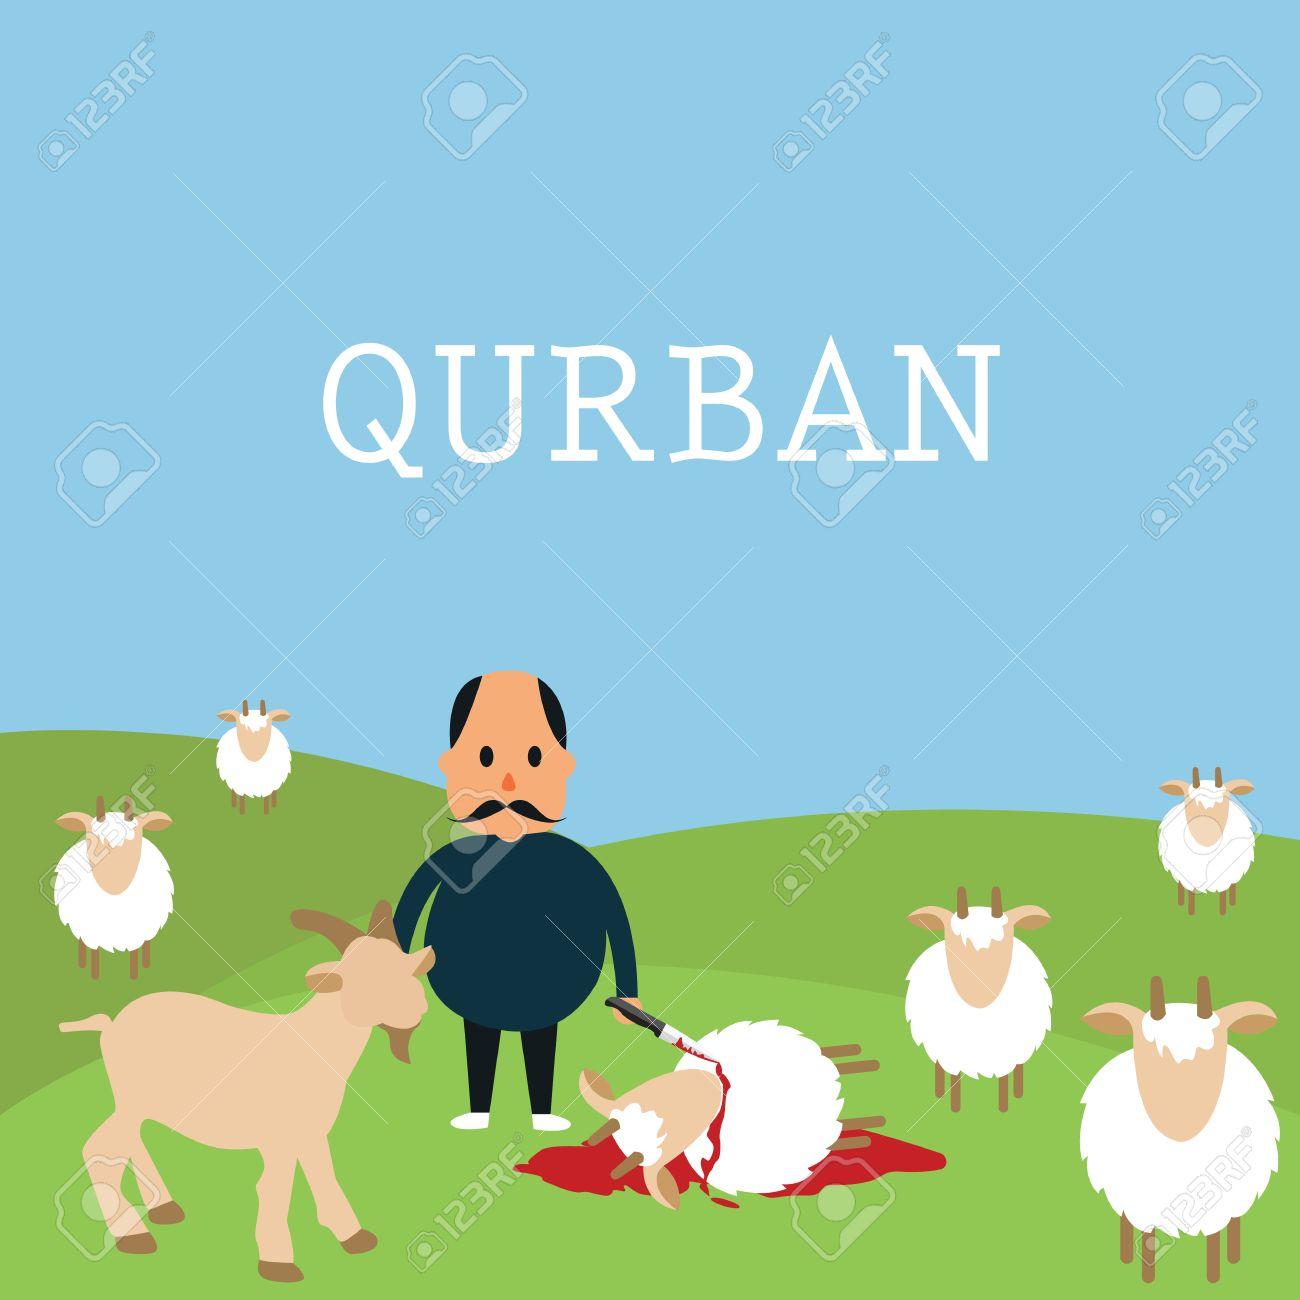 Qurban Sacrifice Kill Goat Lamb In Islam Idul Adha Udhiyyah